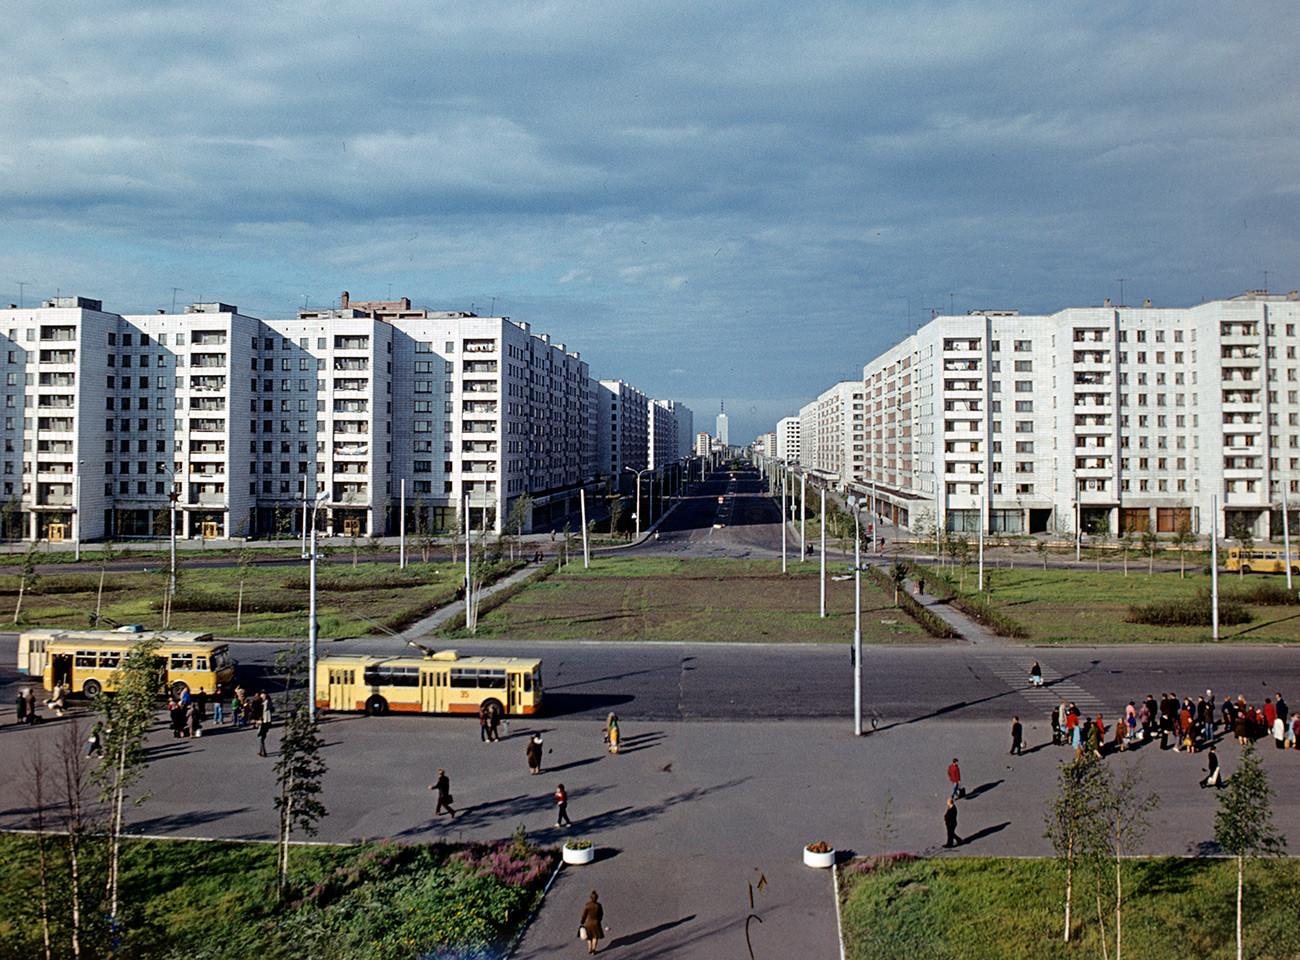 Engels-Straße in Archangelsk